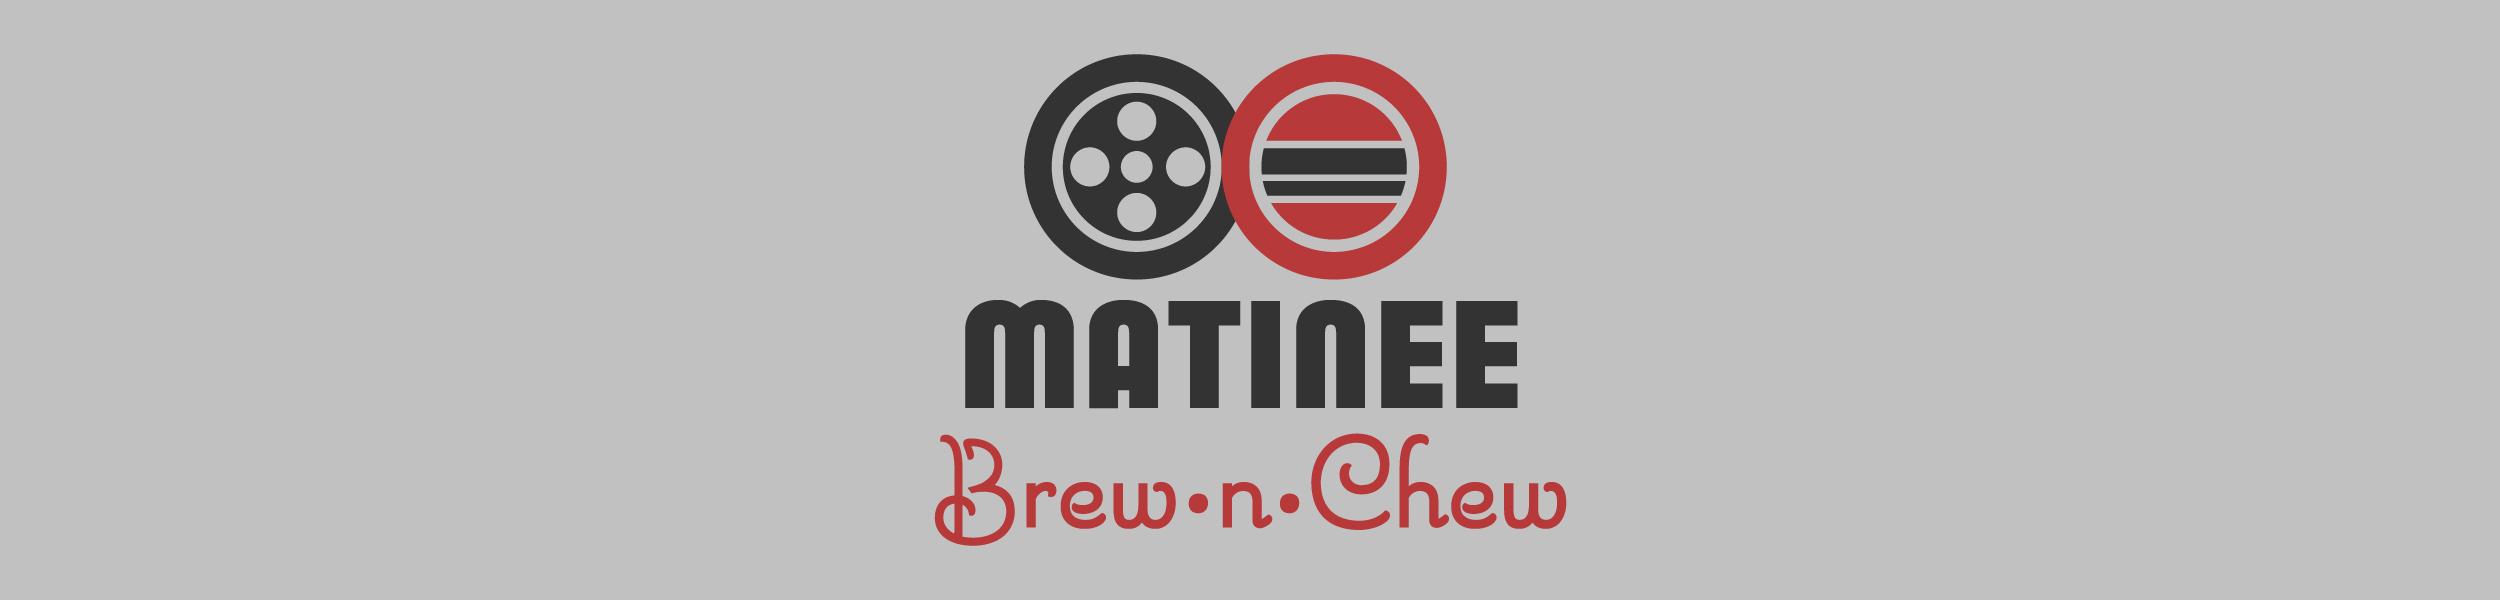 Matinee brew and chew final logo.jpg